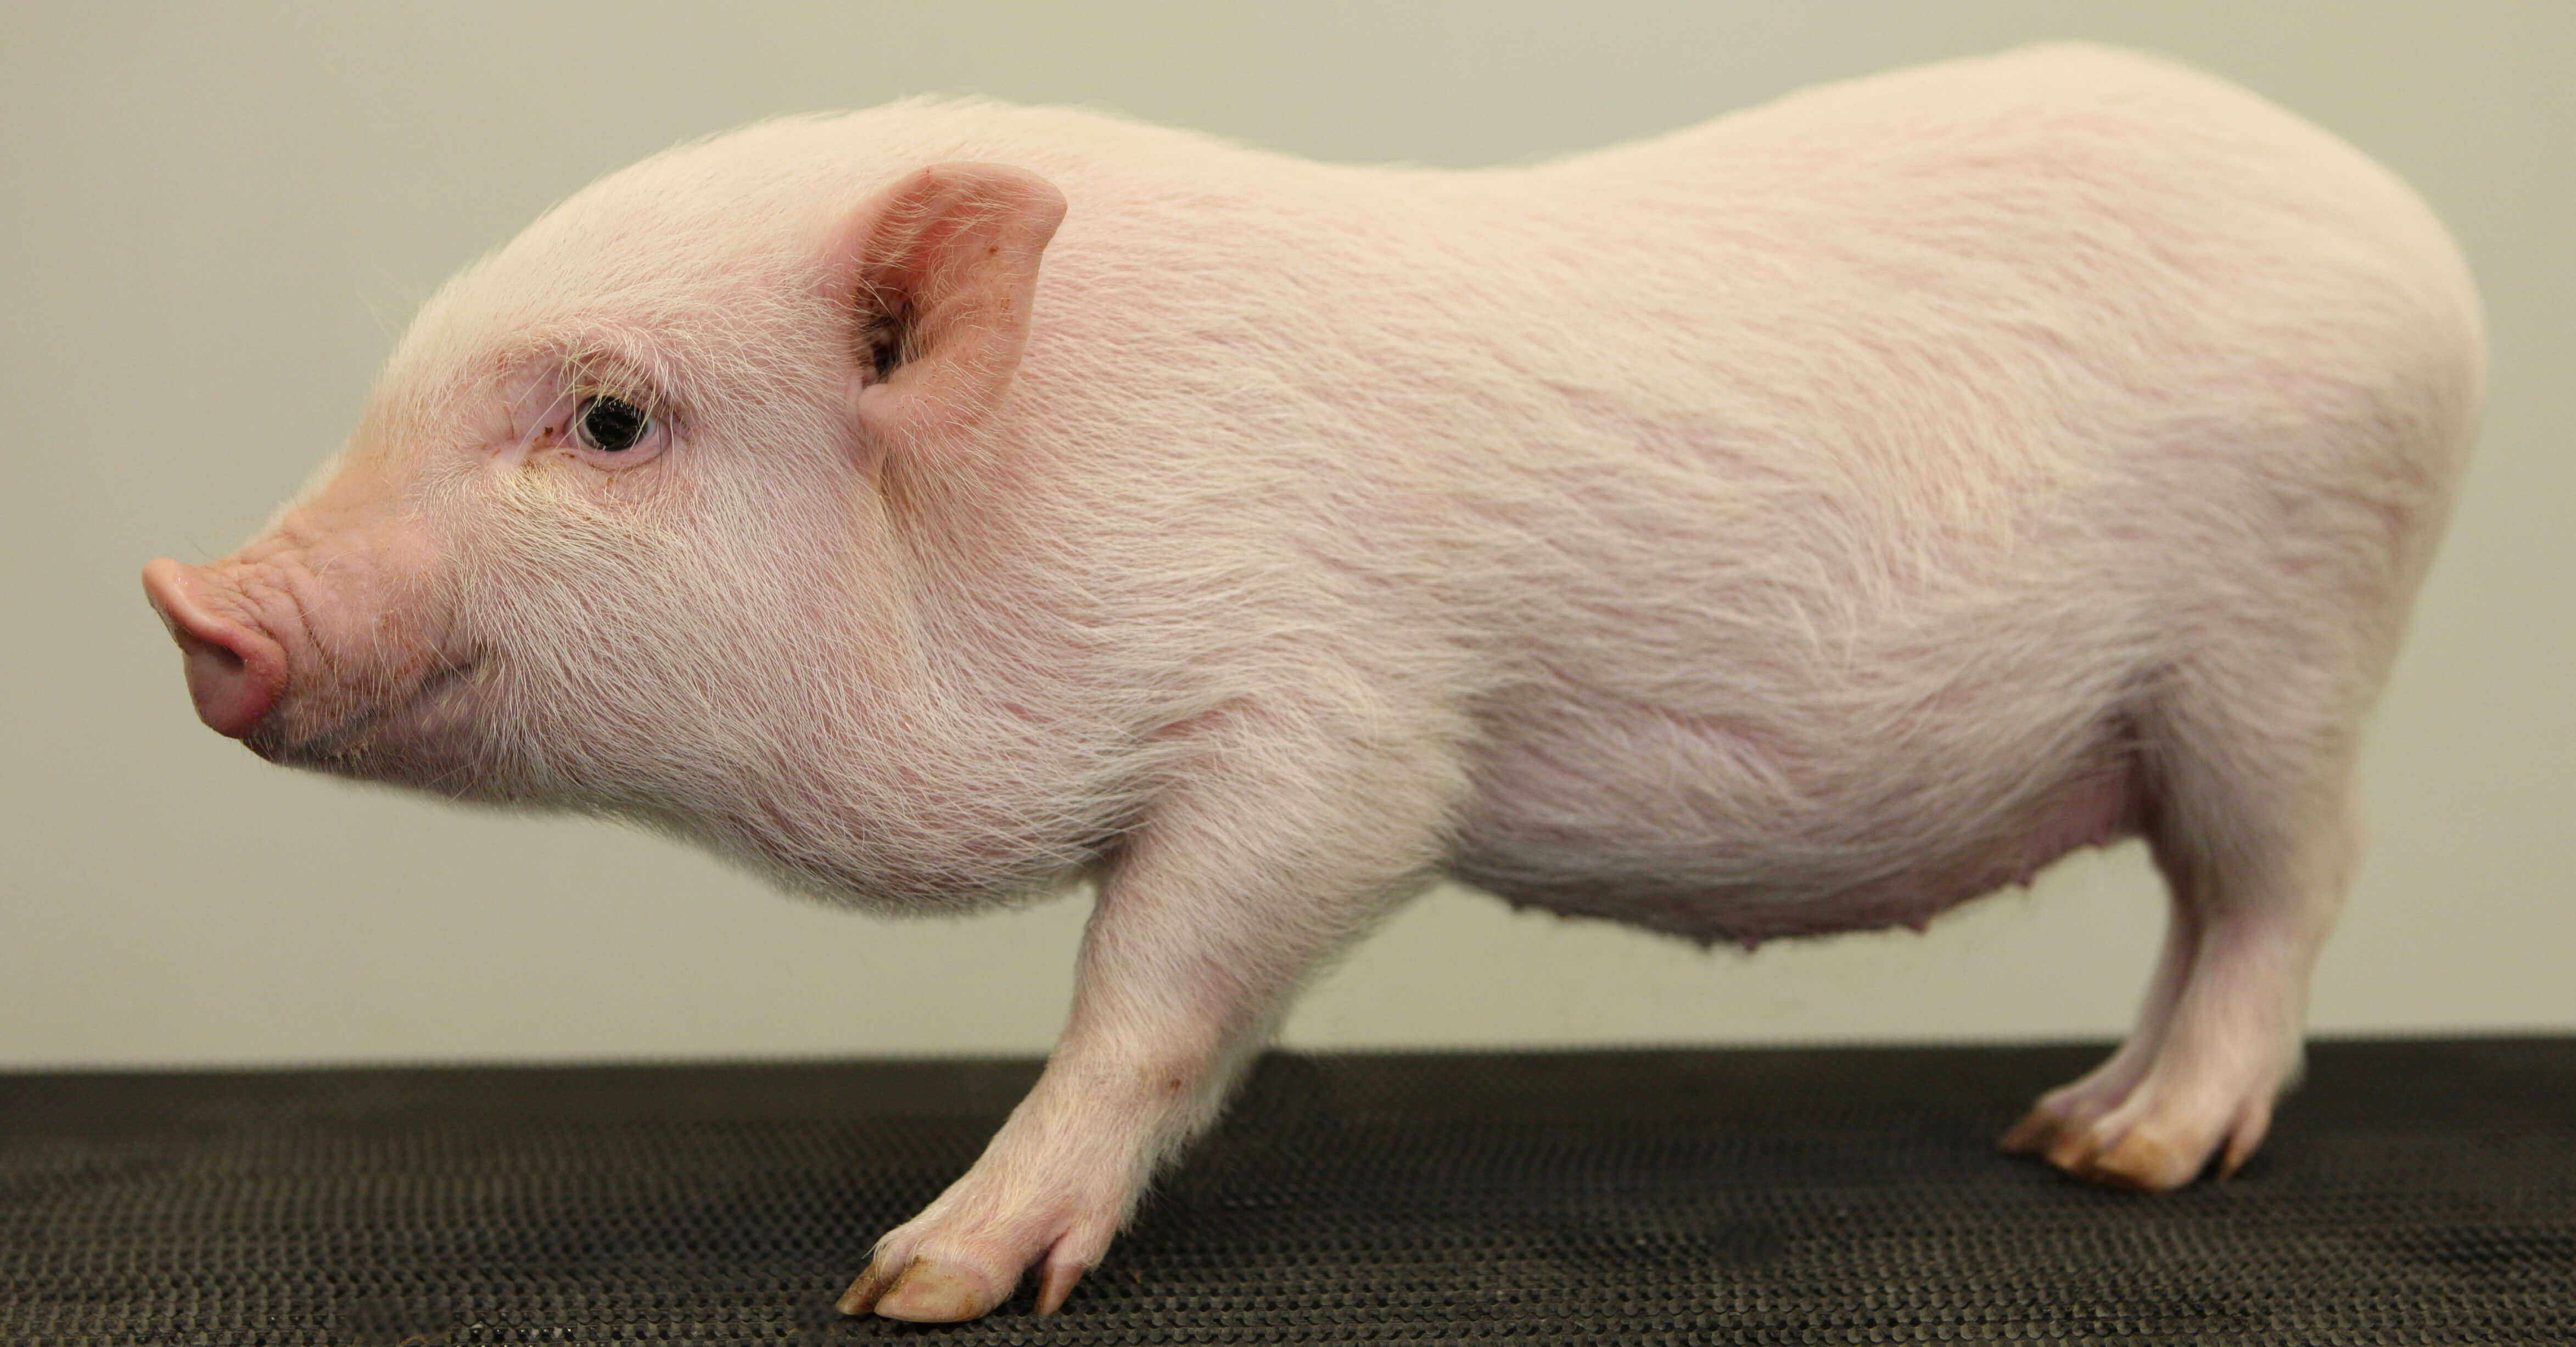 Oso, Minicerdo, Minipig, Monterrey, mini pig, mini pigs